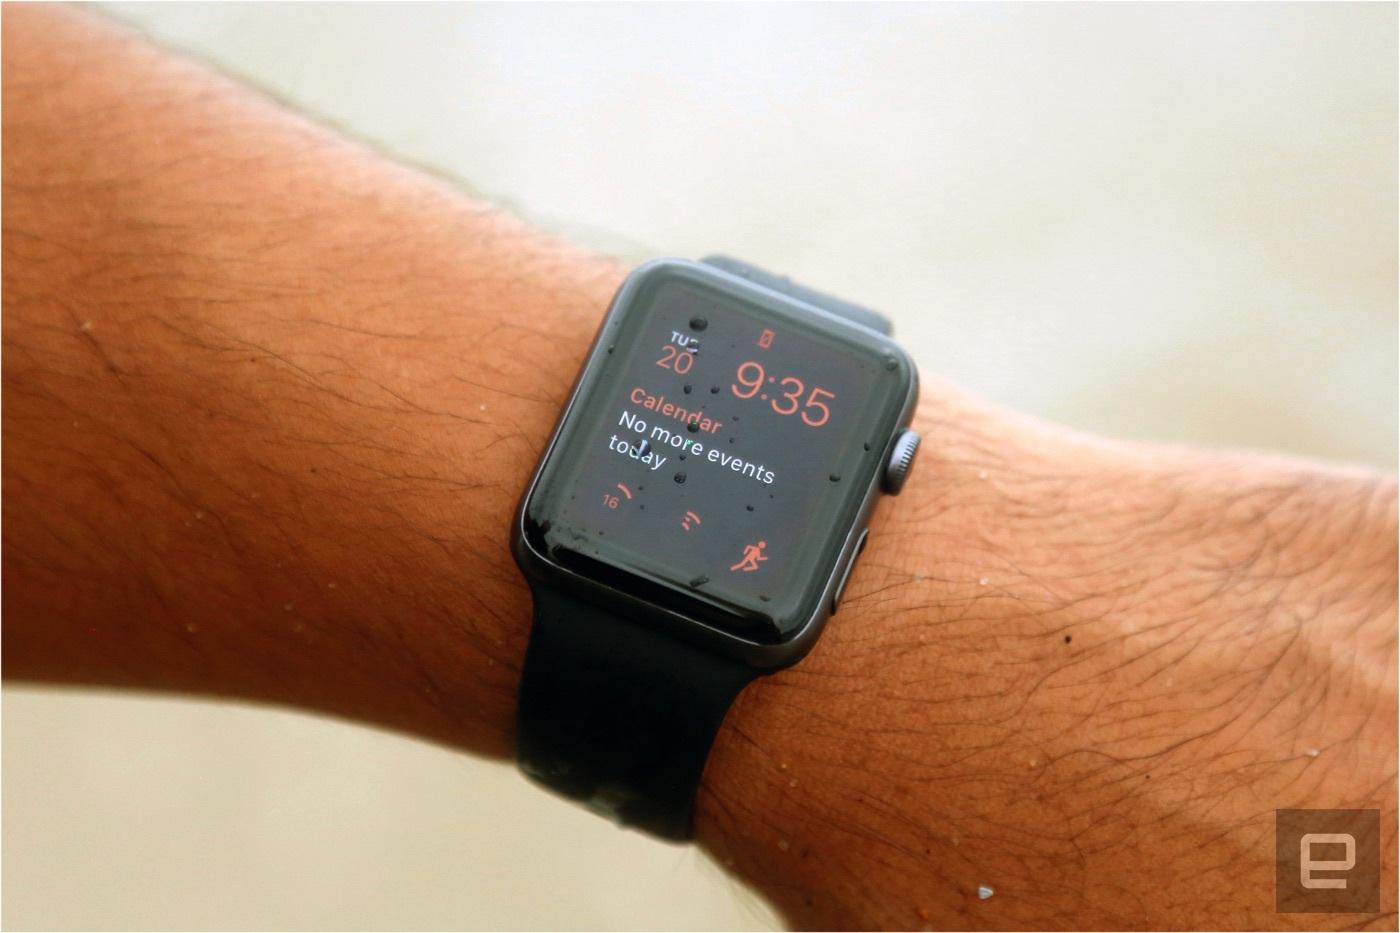 Apple Watch 上一季度在穿戴裝置中銷量奪冠